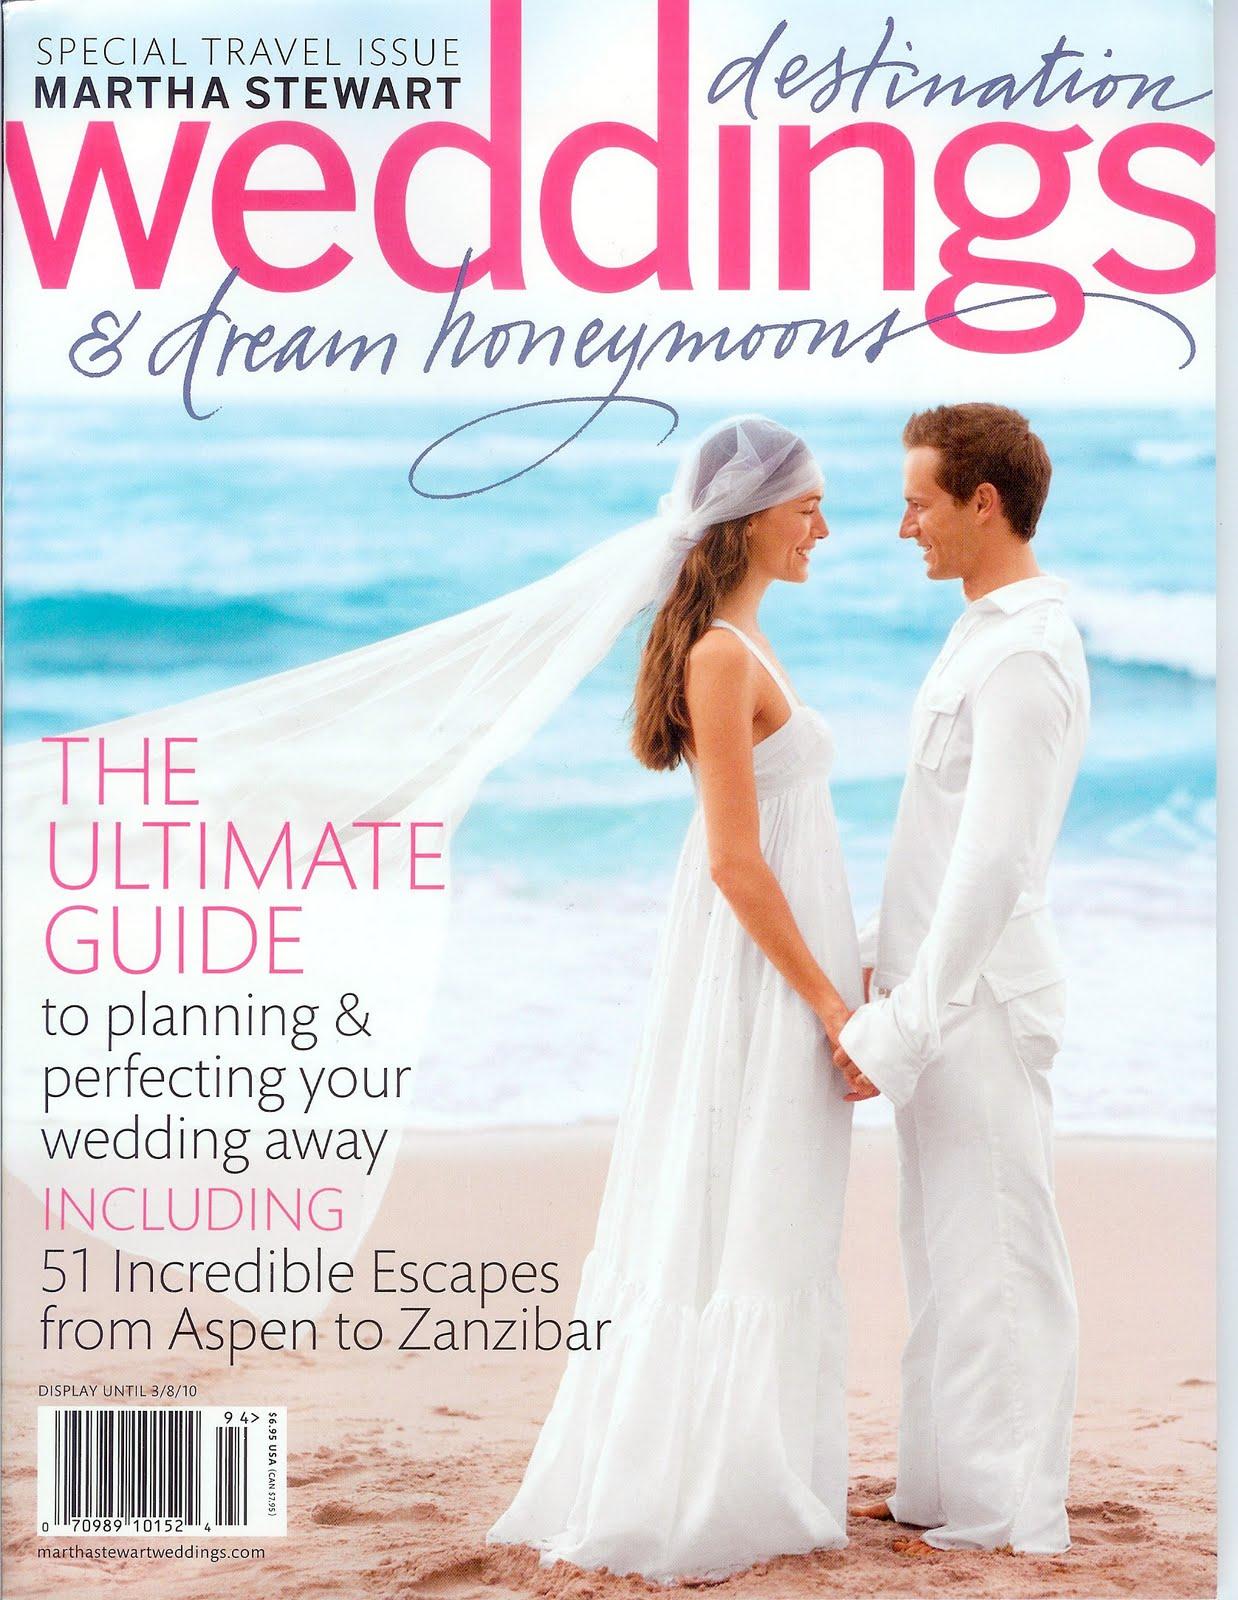 Martha Stewart Weddings Magazine   Plan Your Wedding